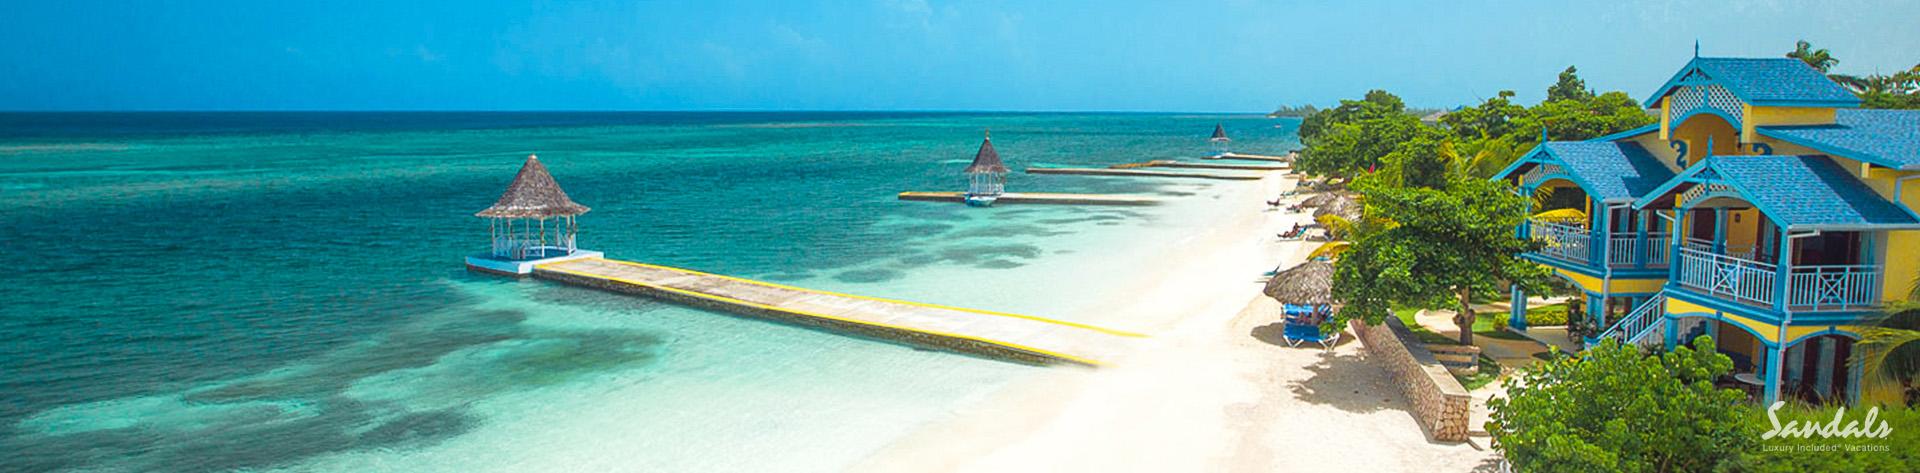 caribbean-resorts-sandals-header1